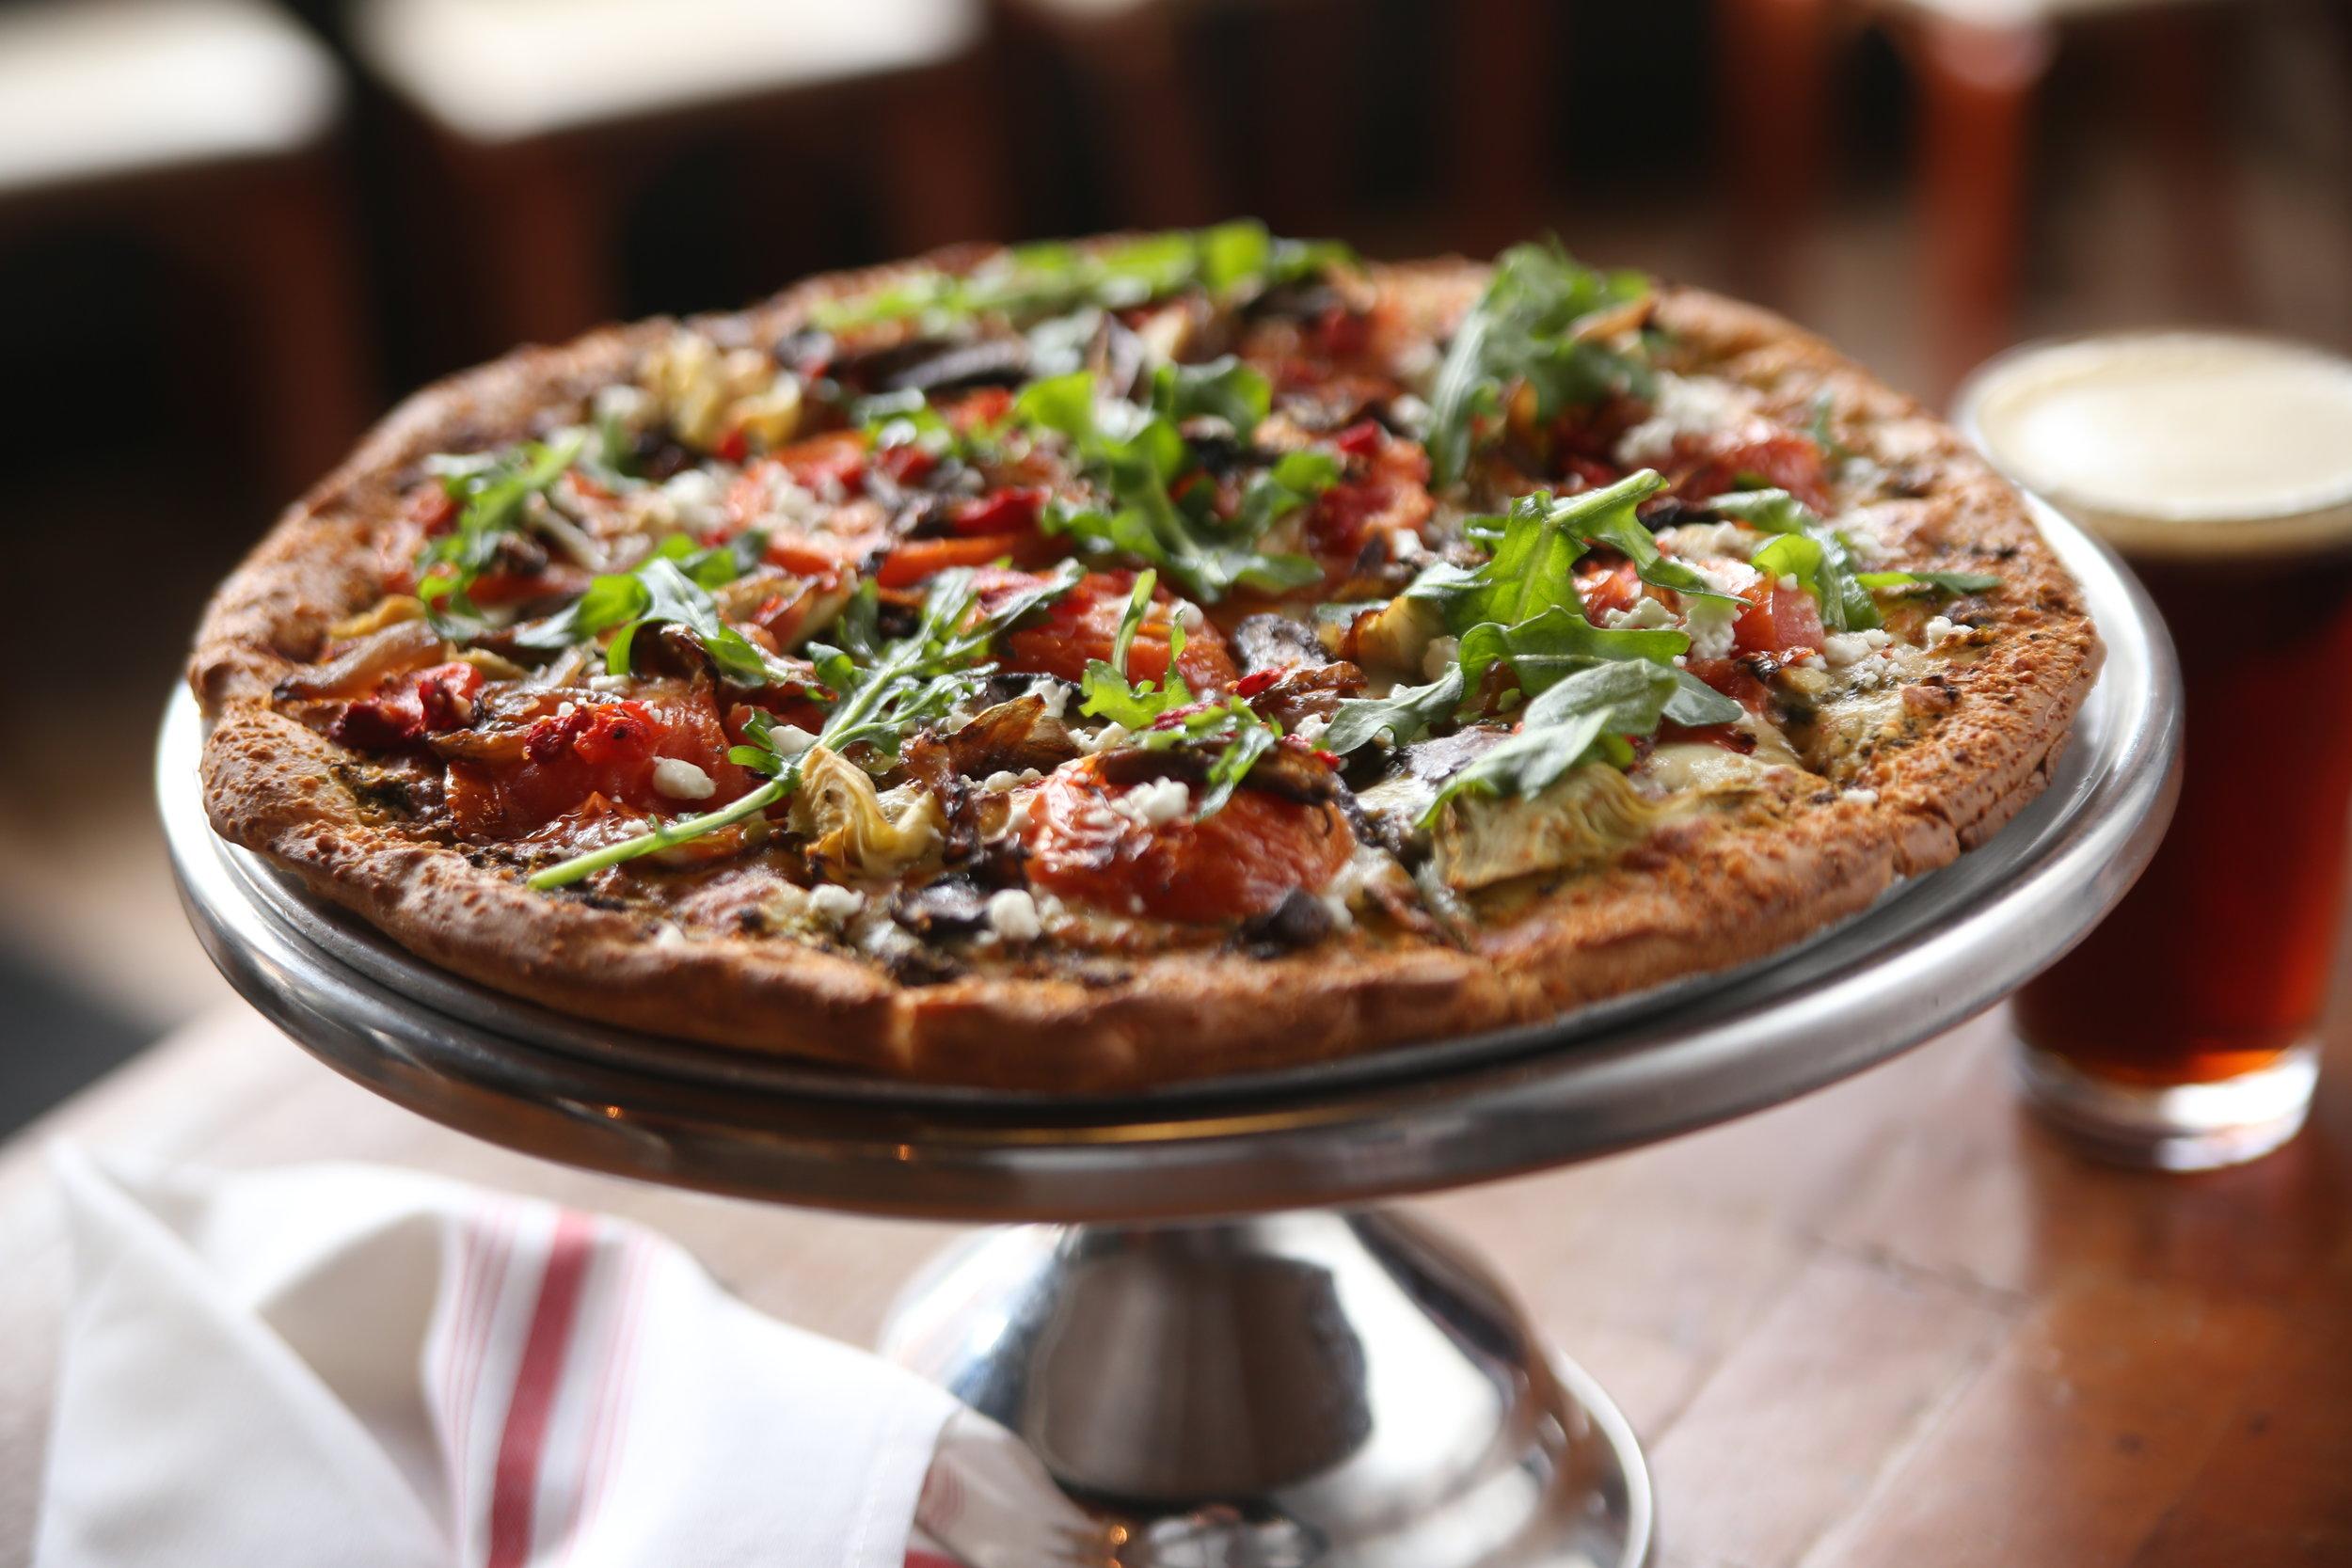 Roasted Vegetable & Pesto Pizza (shown on regular crust)